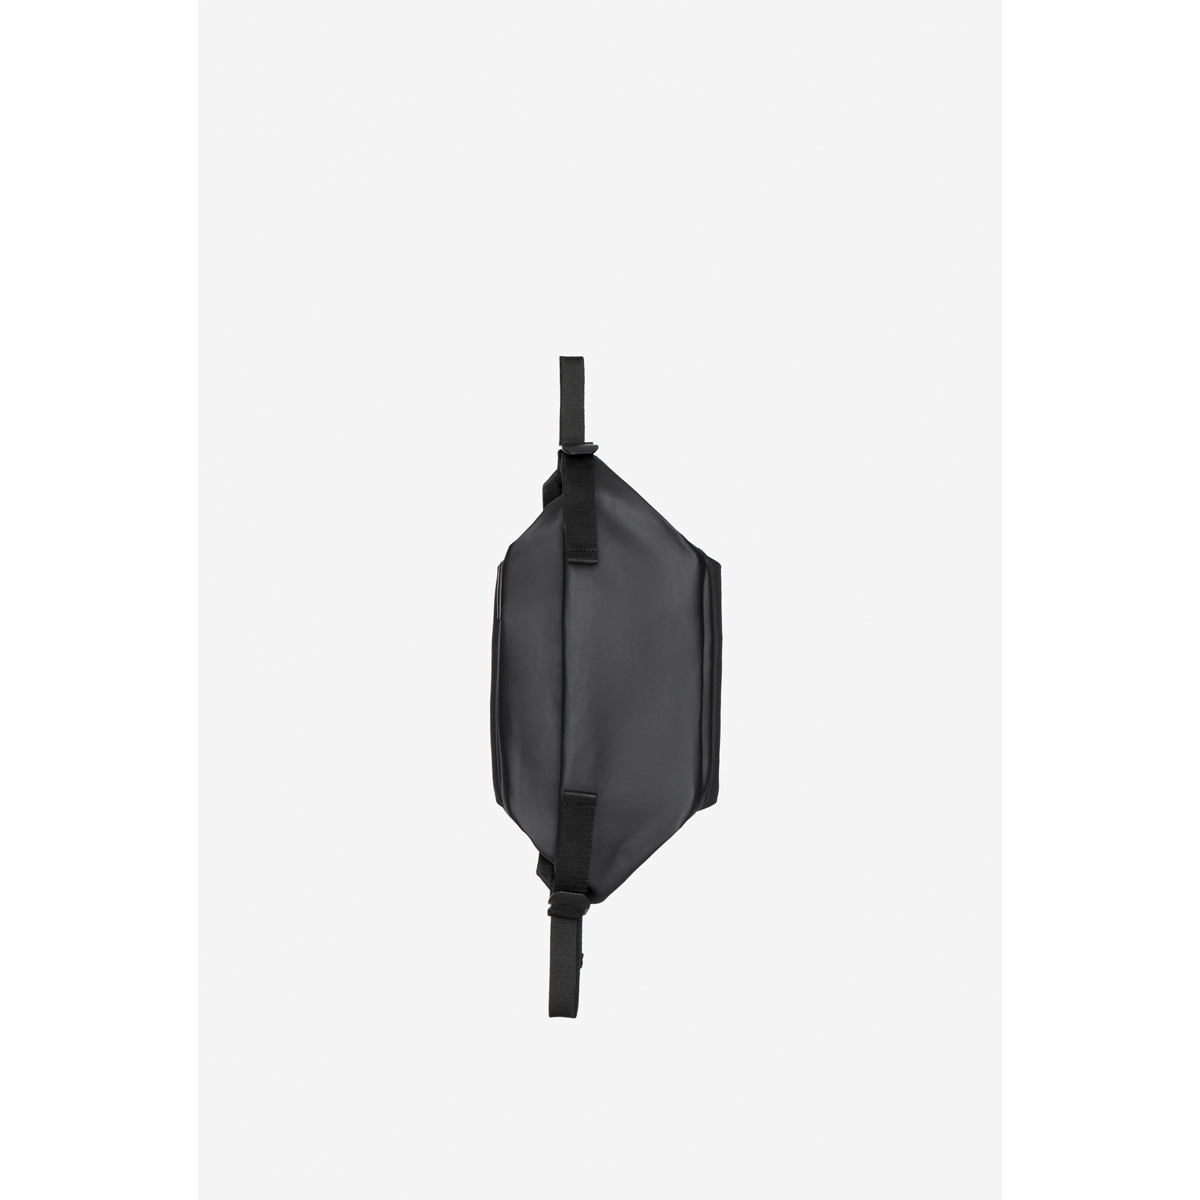 cote&ciel コートエシエル Isarau Small Obsidian Black ボディバッグ ショルダーバッグ コートアンドシエル コートシエル